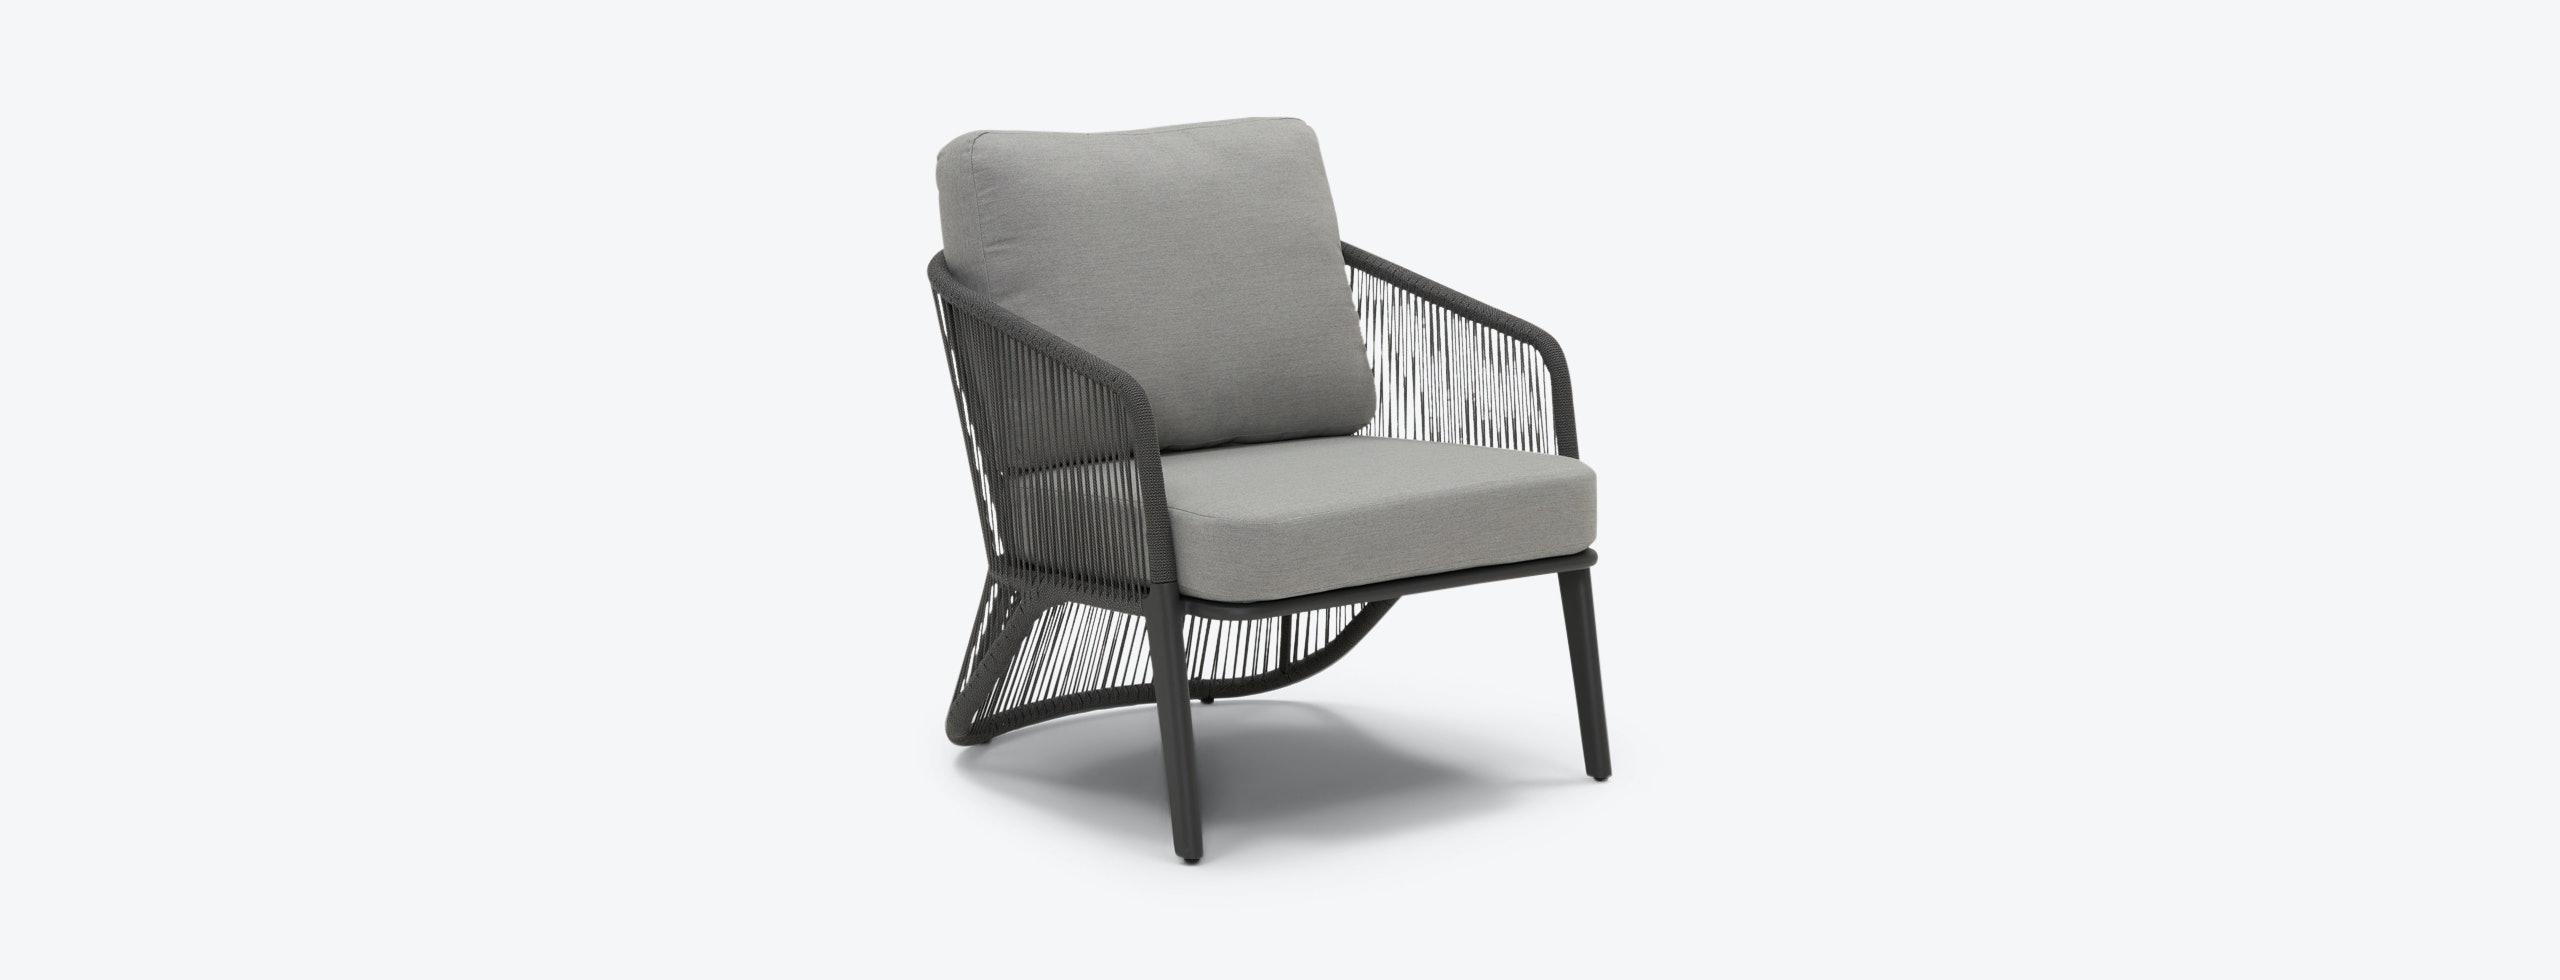 Venice Outdoor Chair